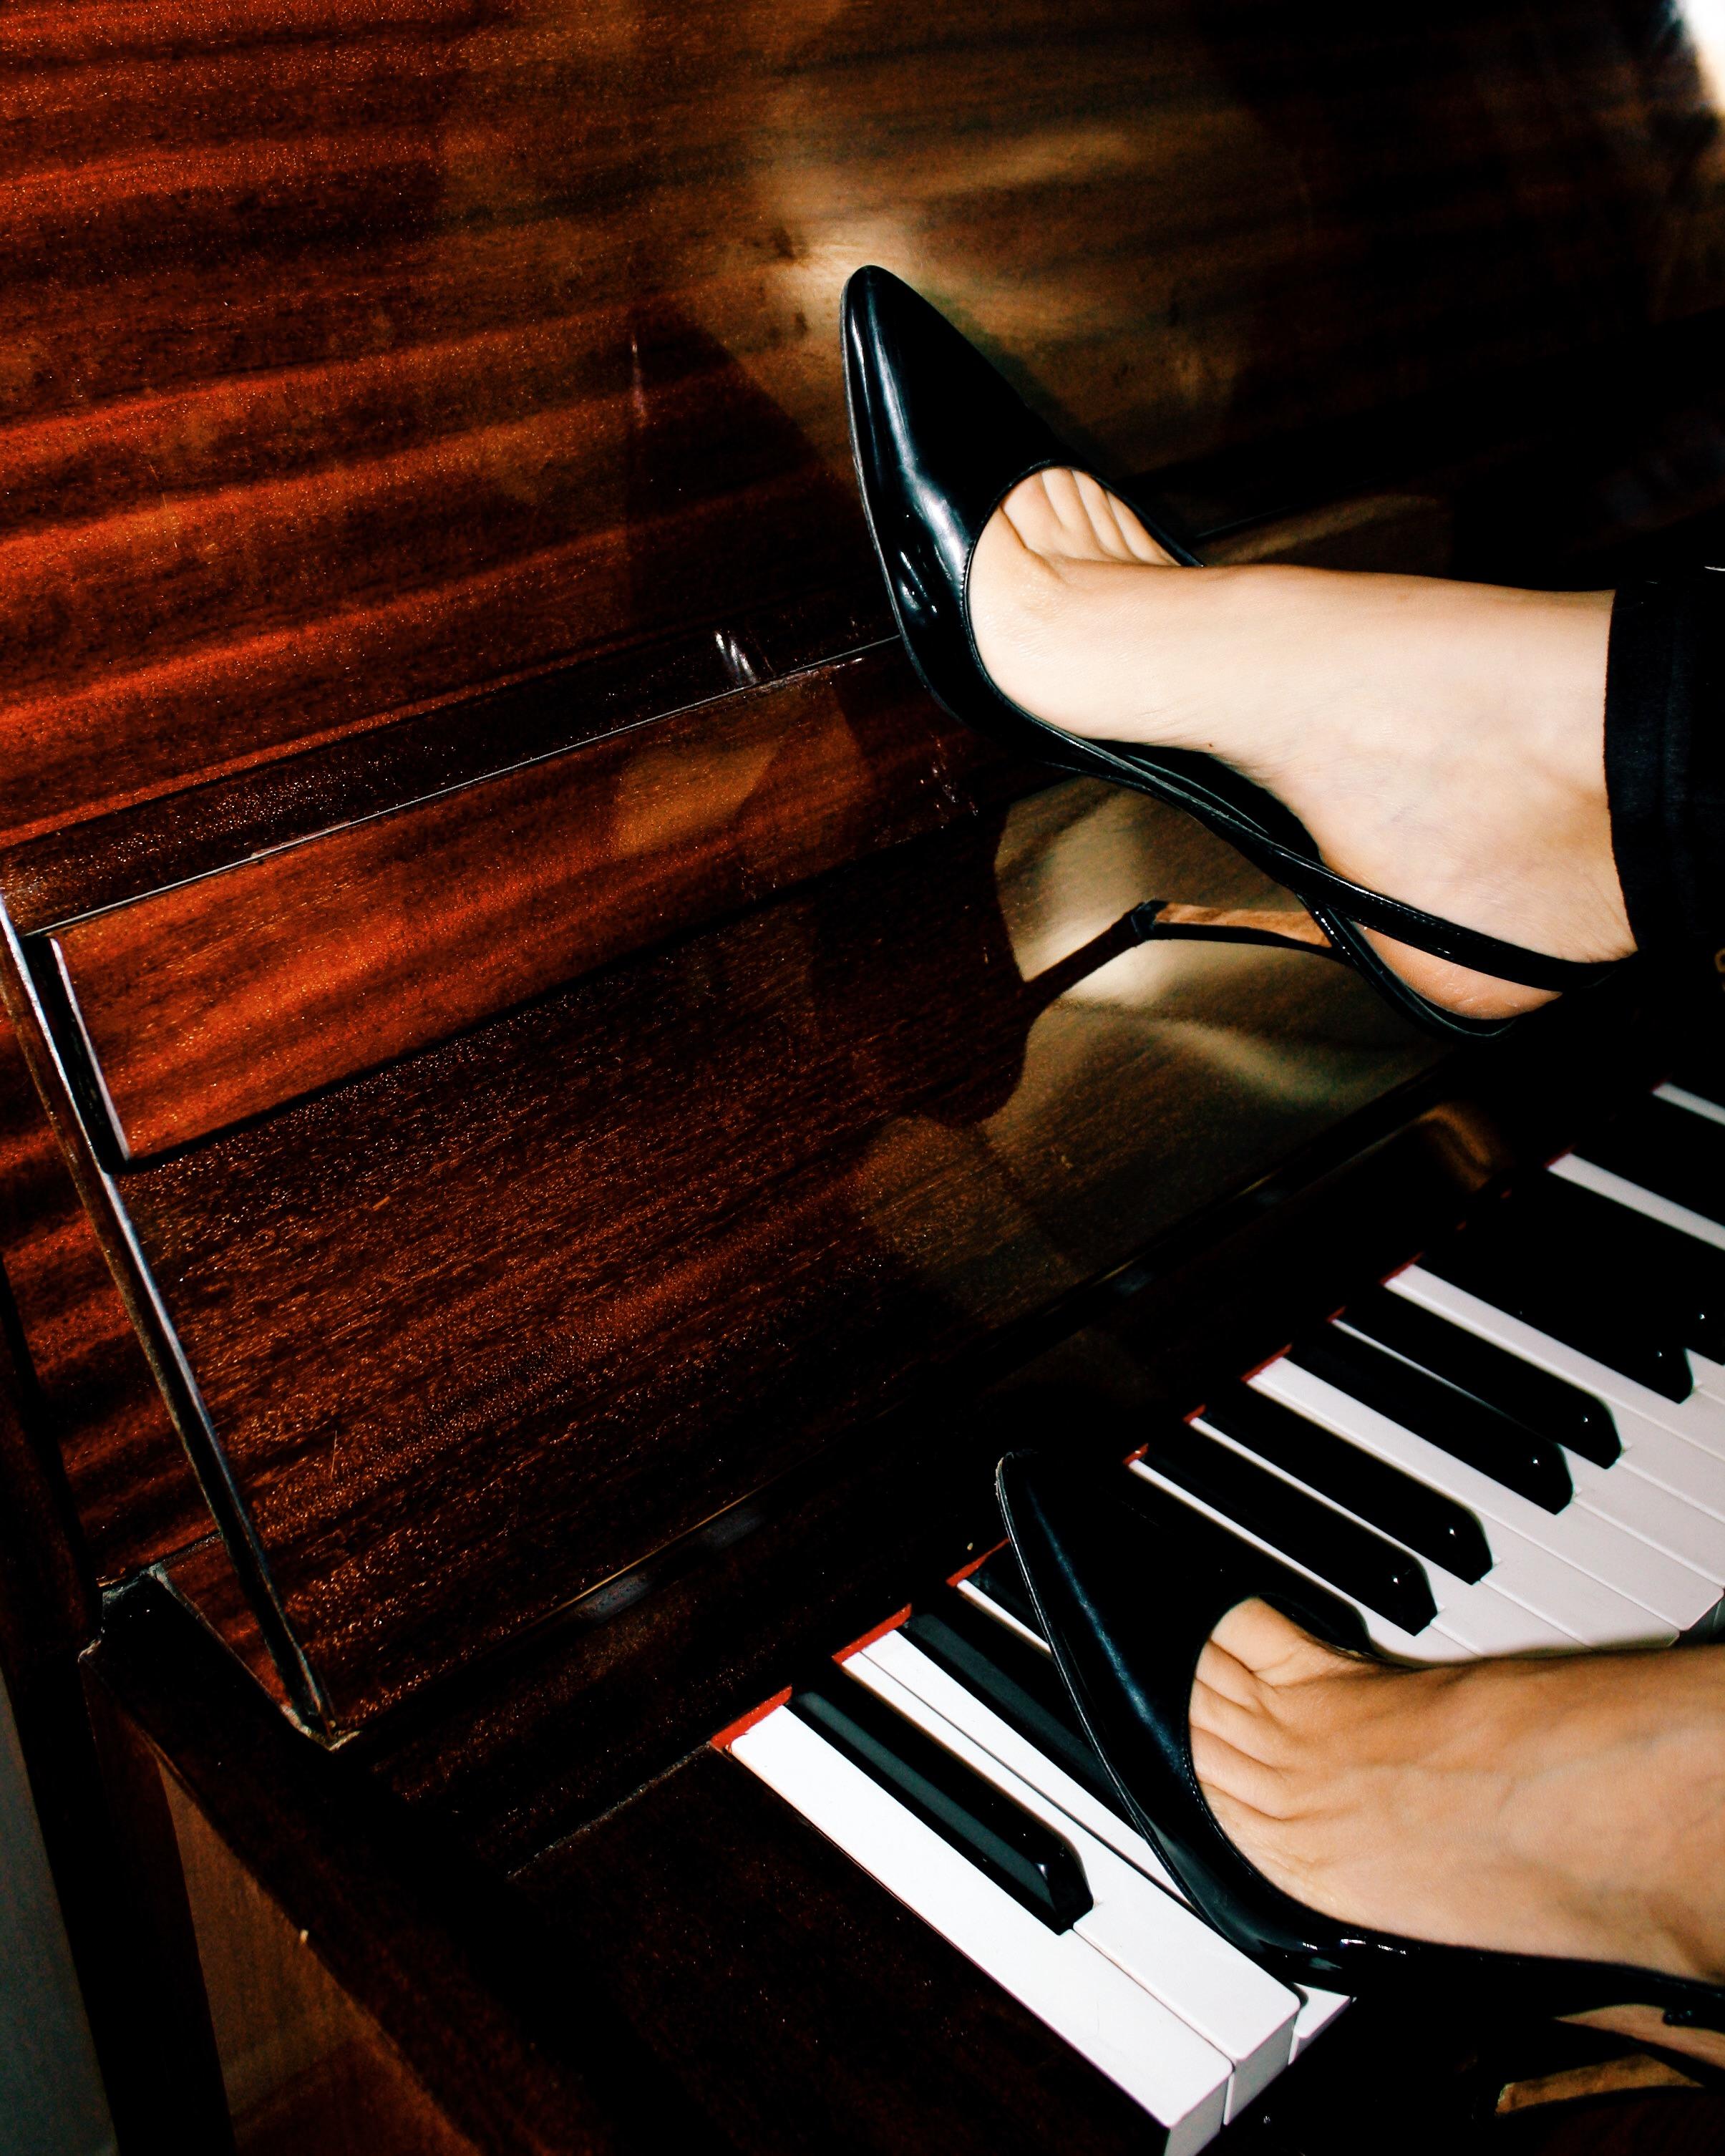 casual outfits manolo blahnik patent leather heels shoes suede pants piano white tank fur stole jacket corset belt